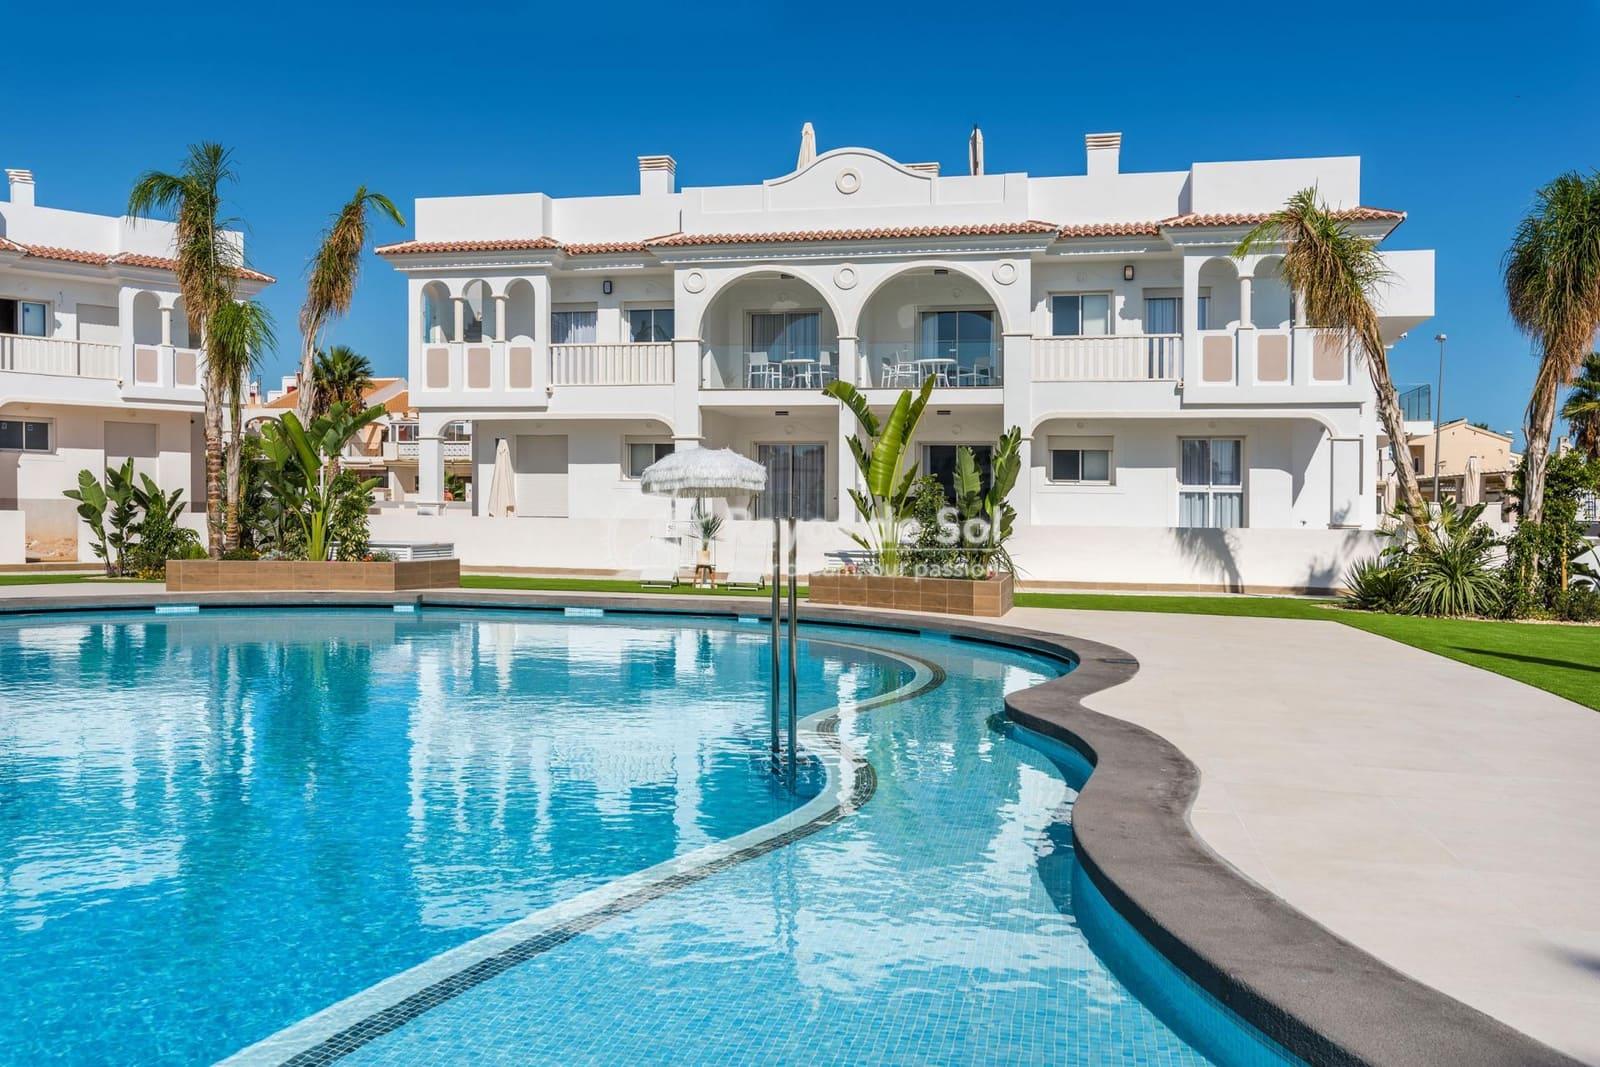 3 bedroom Apartment for sale in Ciudad Quesada with pool - € 222,000 (Ref: 3917120)